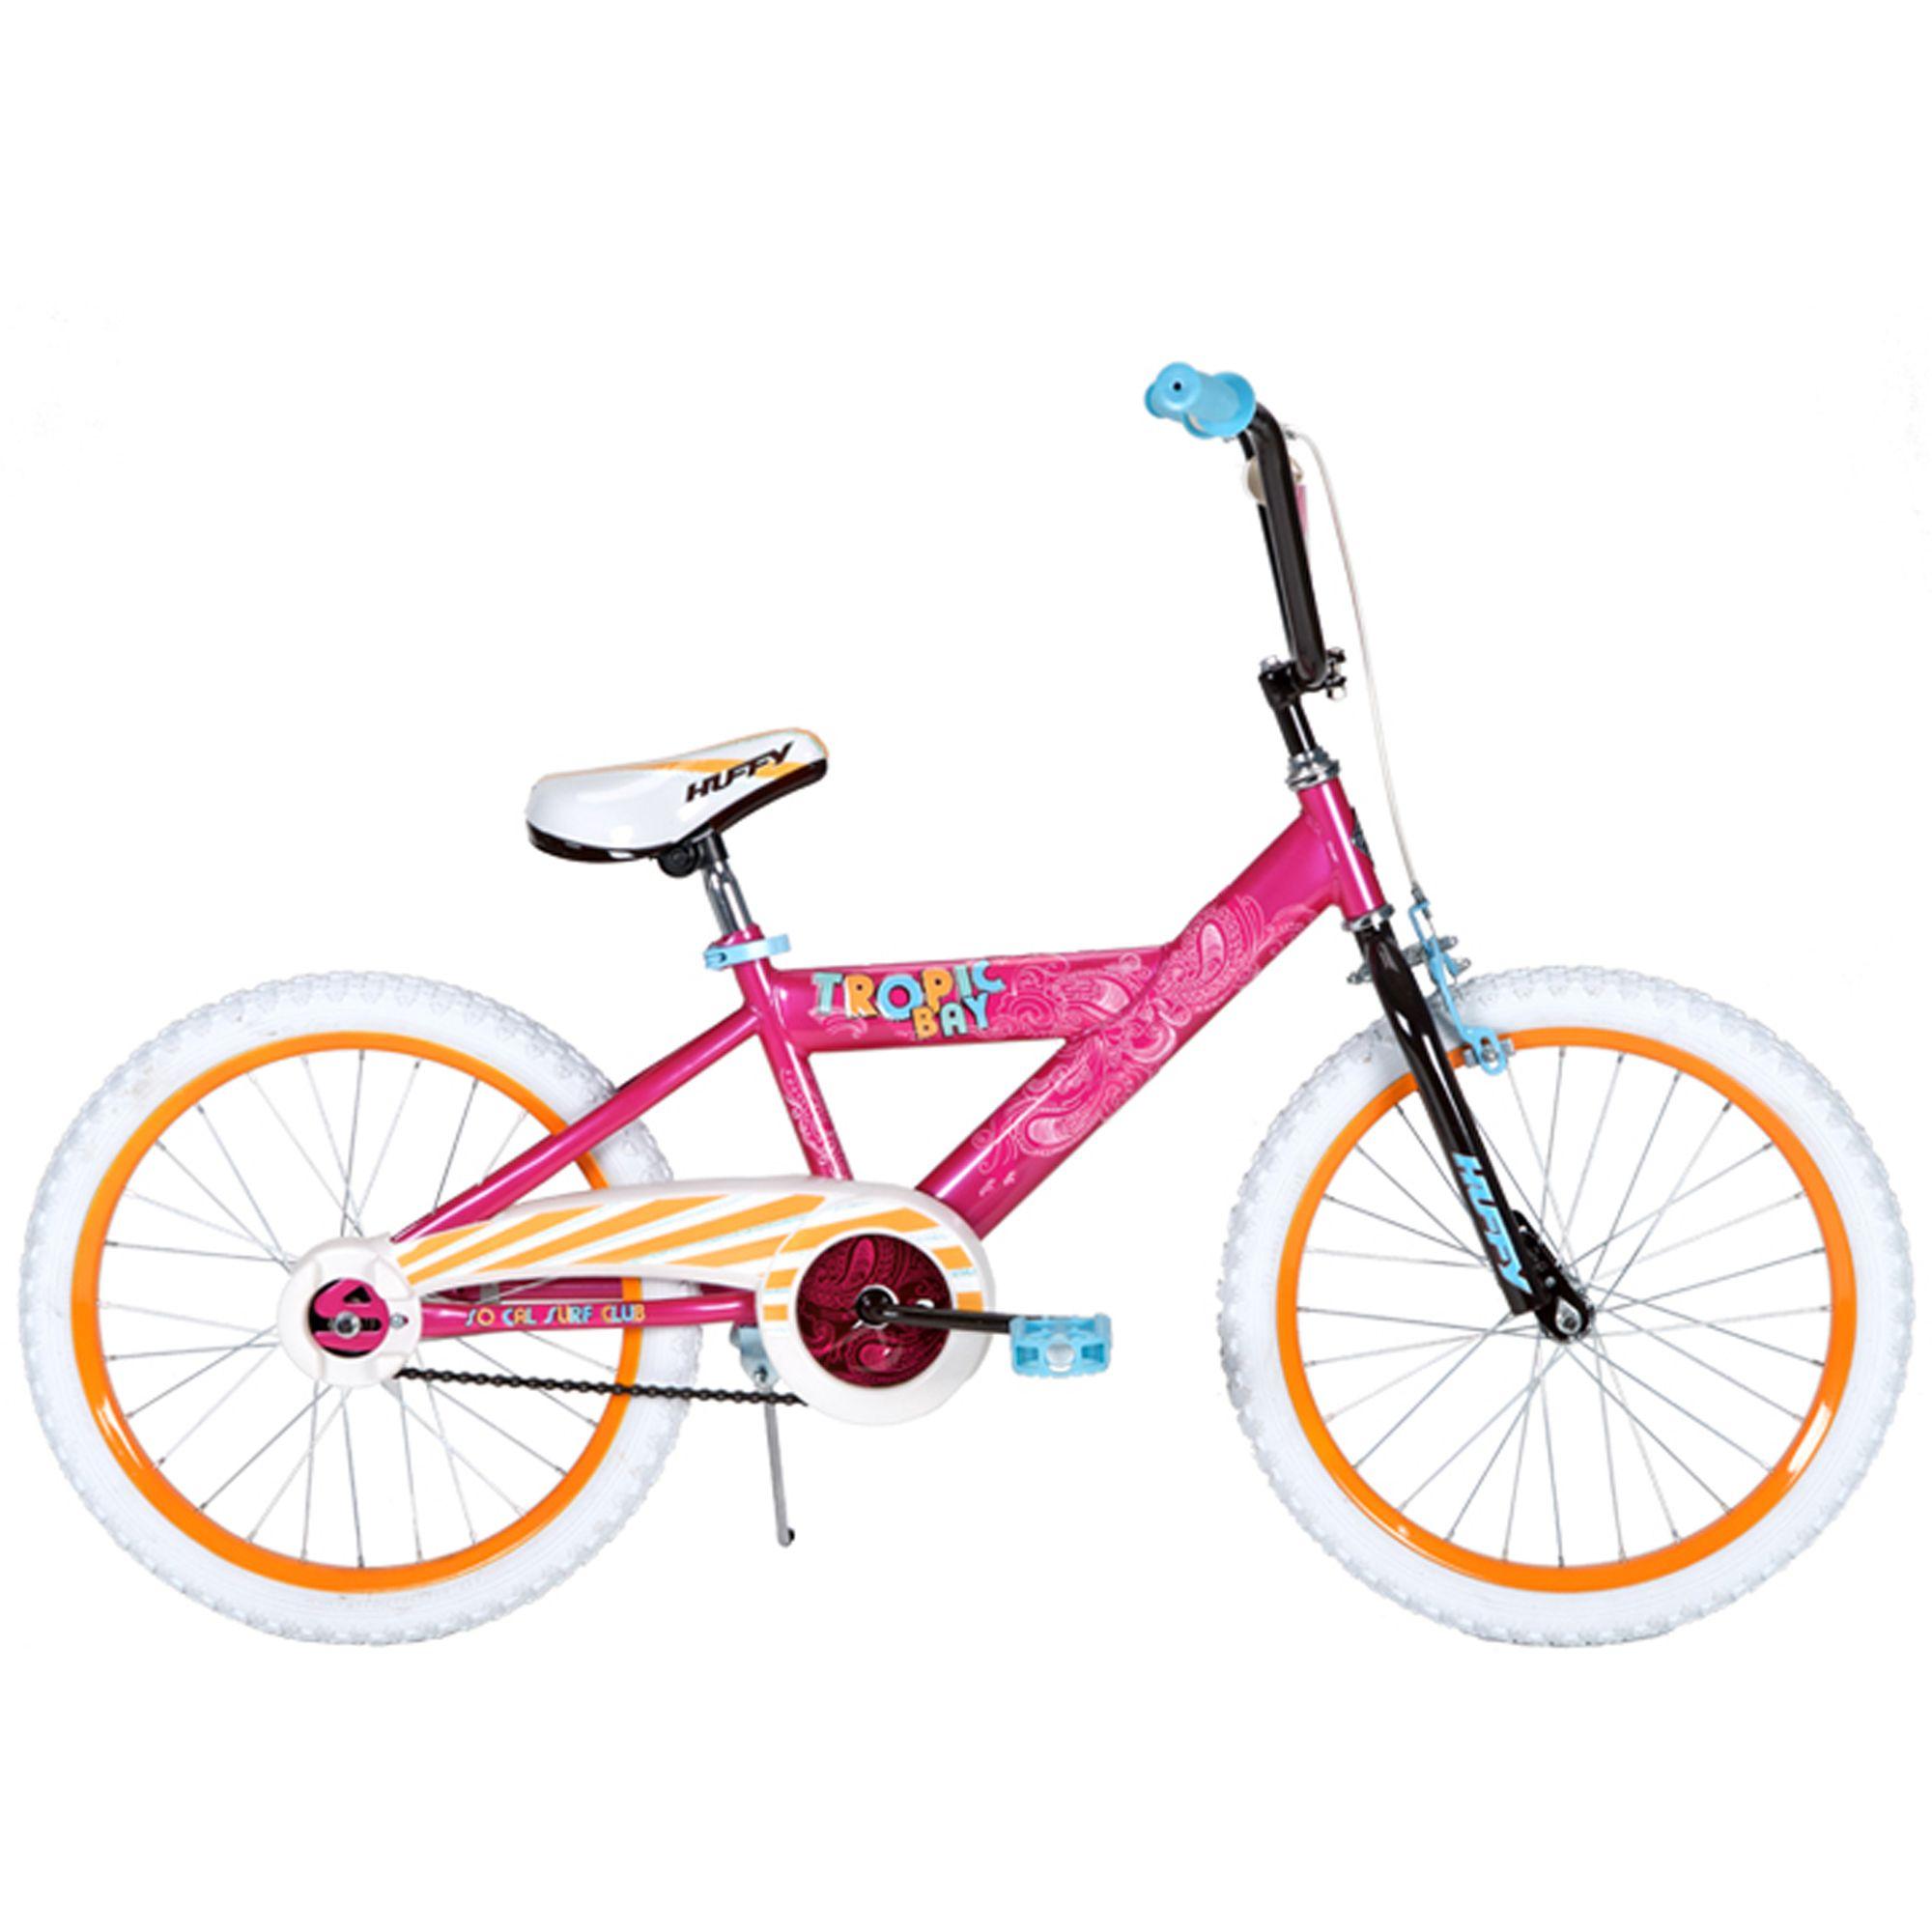 Huffy bike activation code